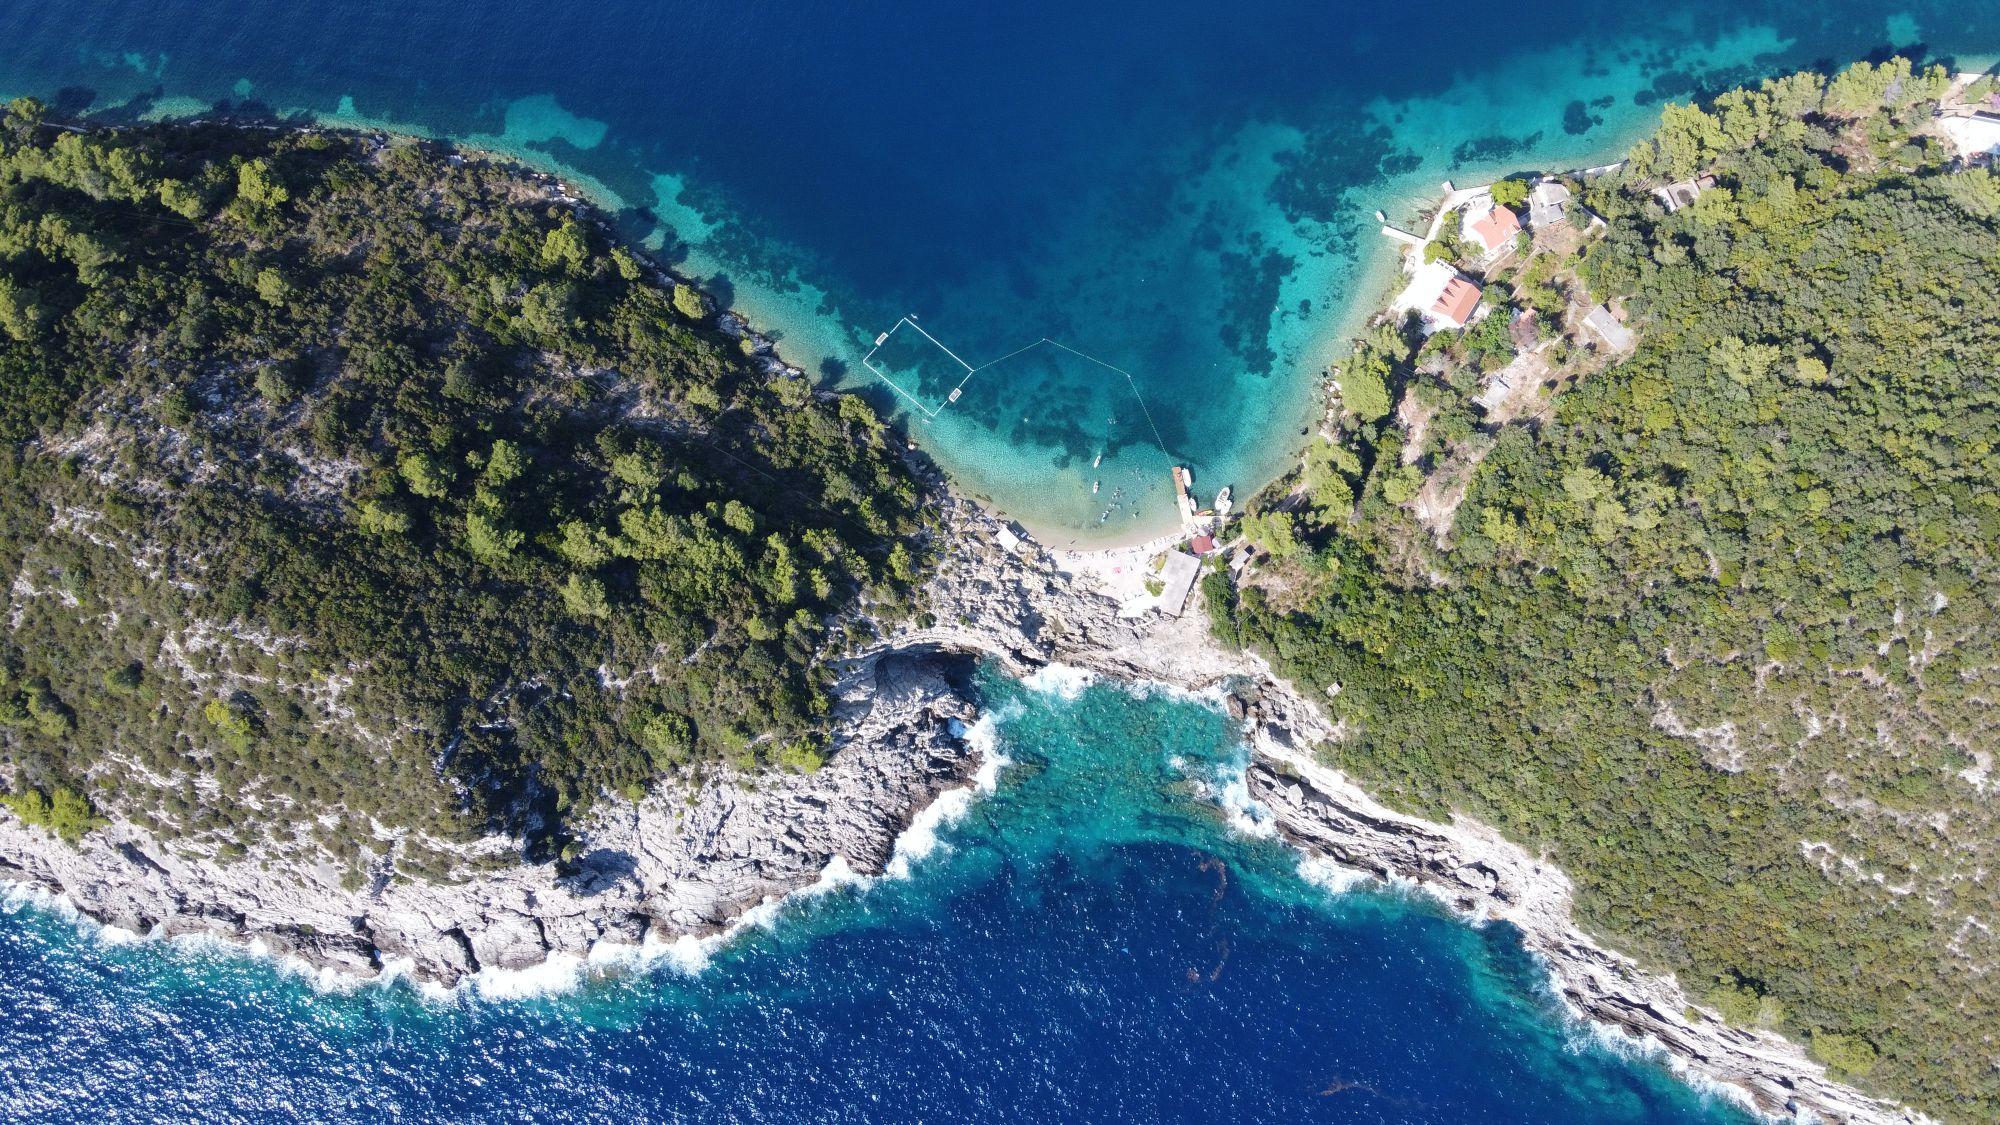 Šipan, Elaphiti islands, Croatia, photo by K2 & Croatian Attractions